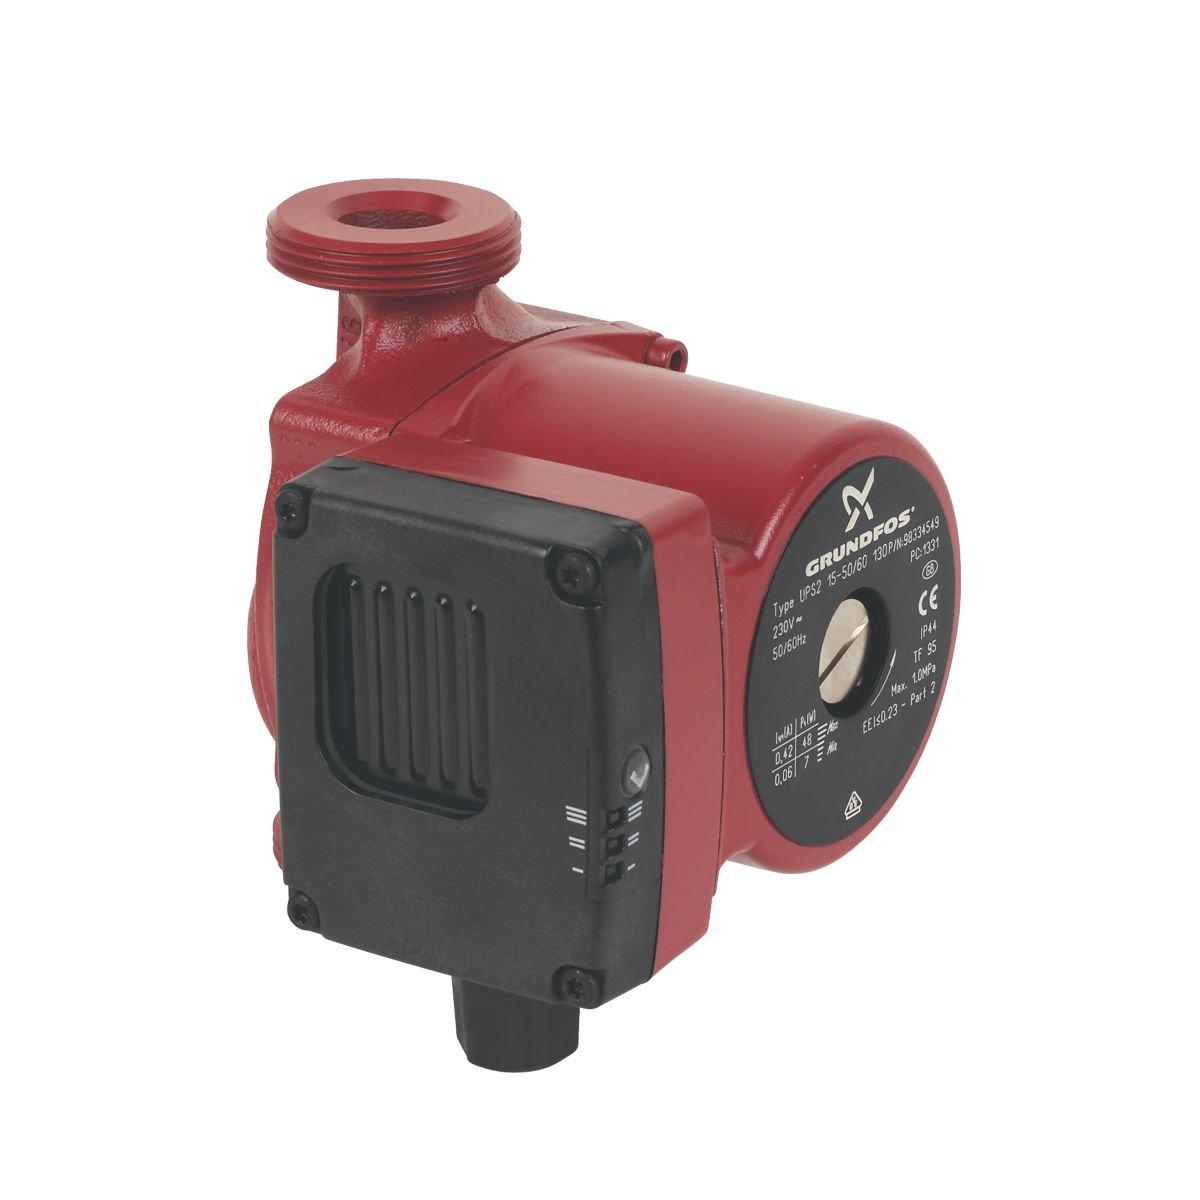 Grundfos UPS2 15-50/60 Central Heating Pump